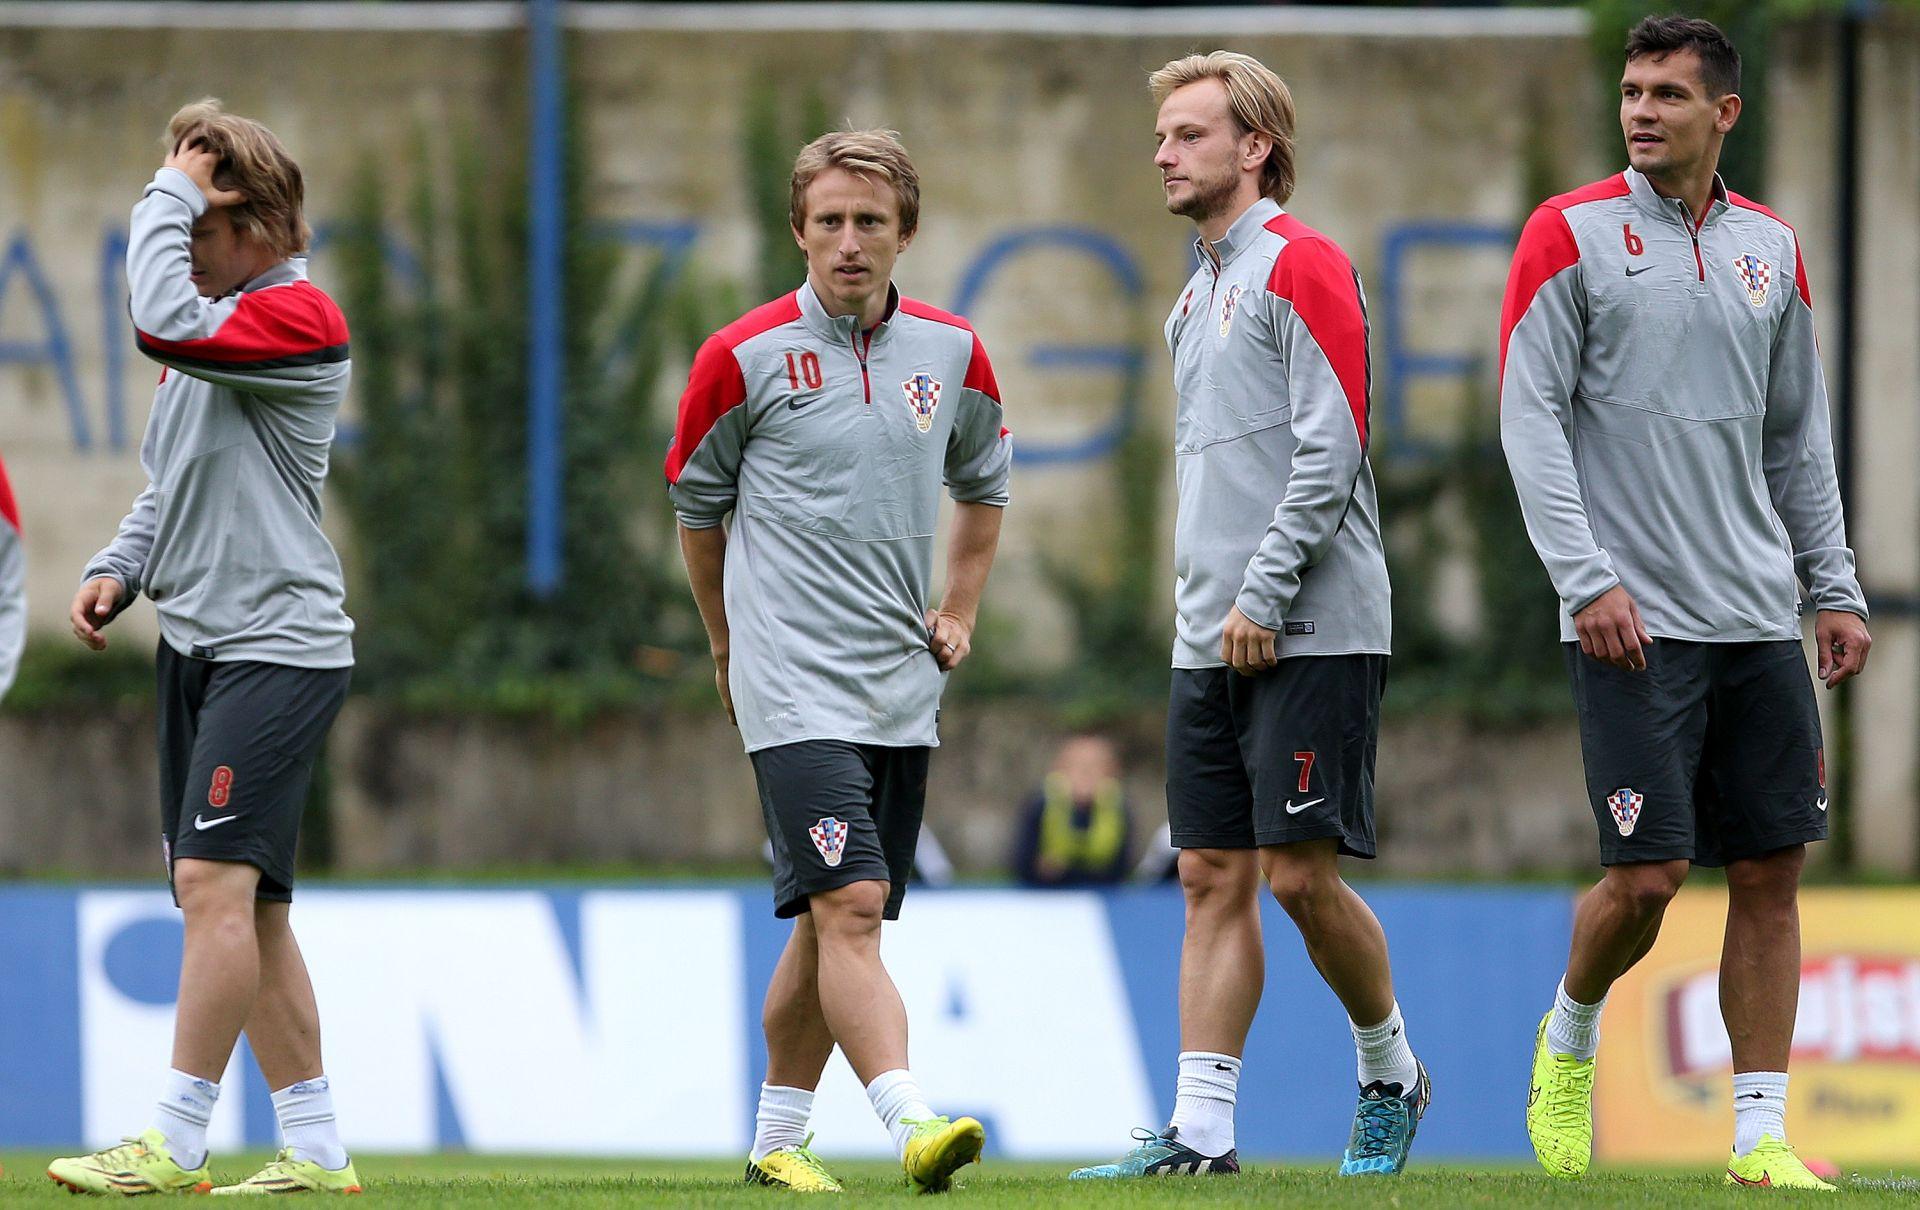 IDEALNA MOMČAD GODINE Ivan Rakitić i Luka Modrić među nominiranima za WORLD XI 2015